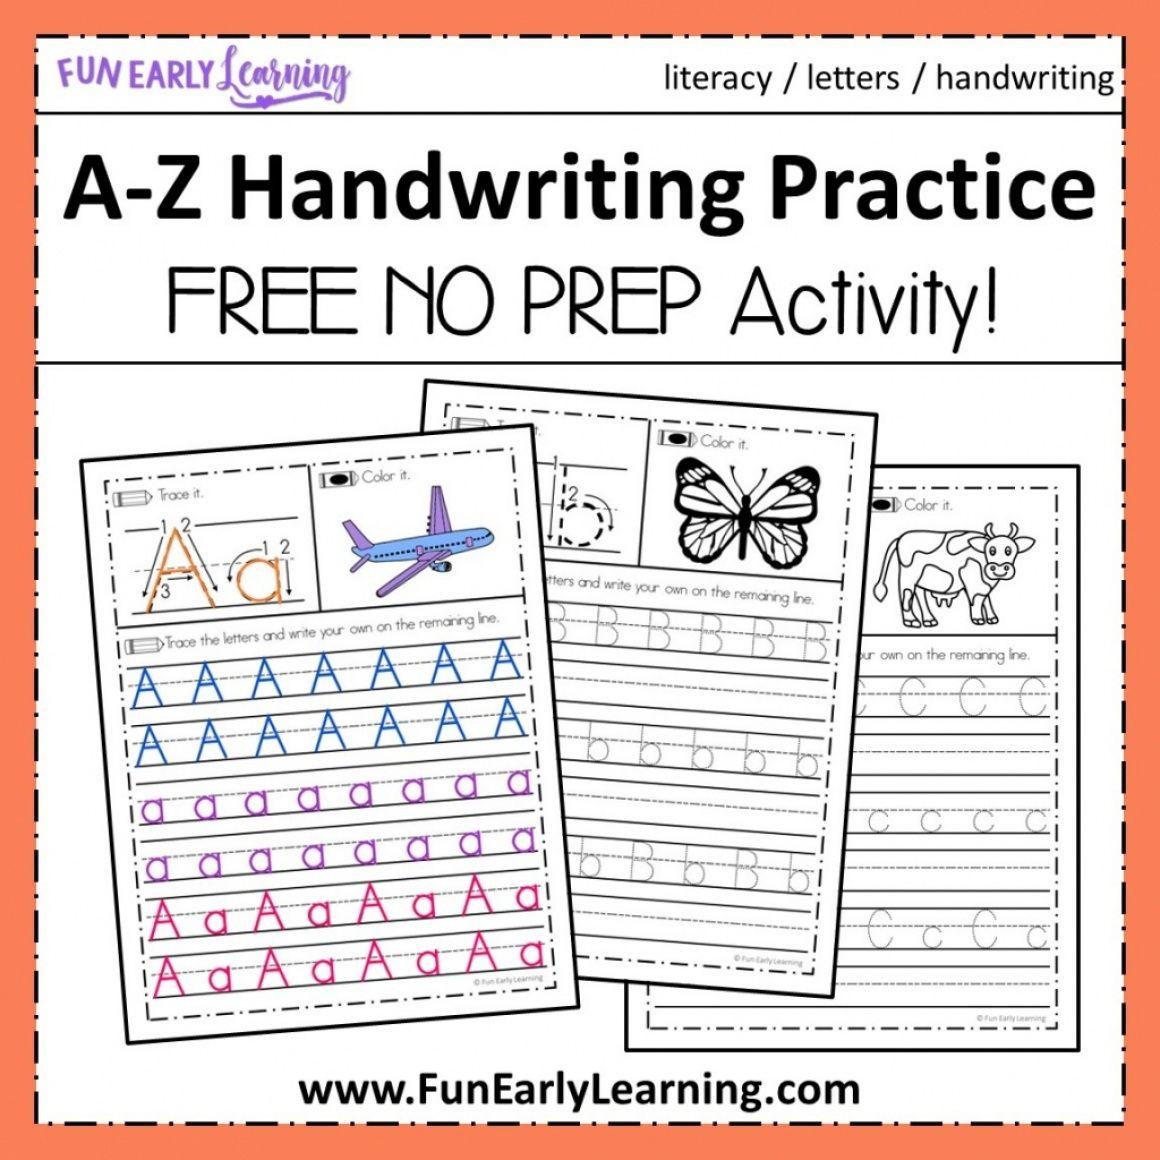 A Z Handwriting Practice Kids Handwriting Practice Handwriting Practice Free Handwriting Practice Worksheets